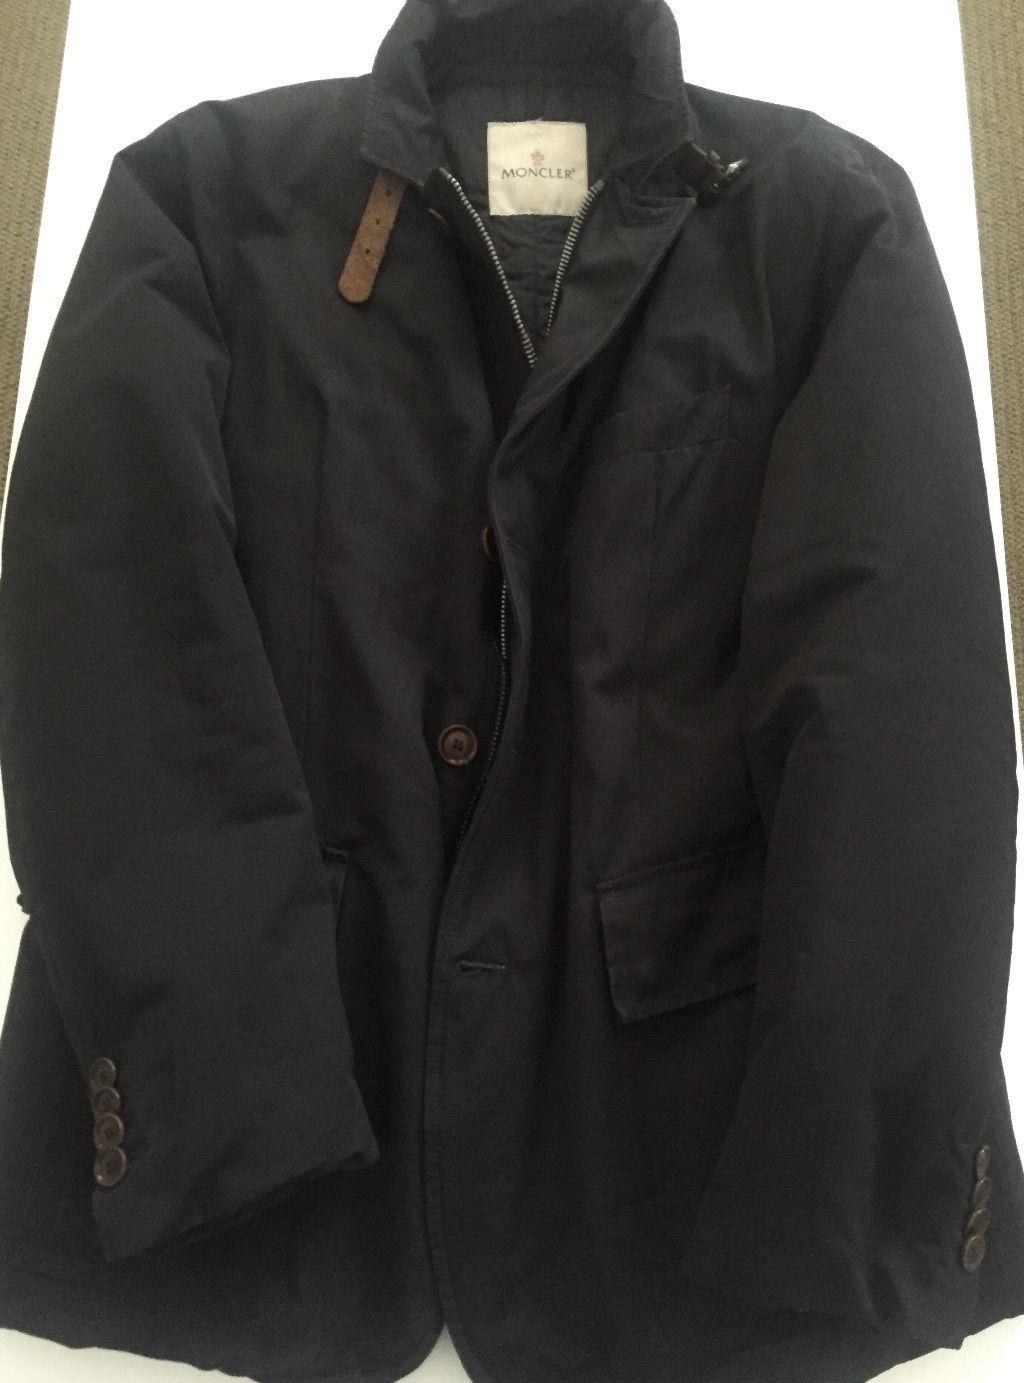 Moncler mens navy down quilted blazer size 4 eBay Жилет